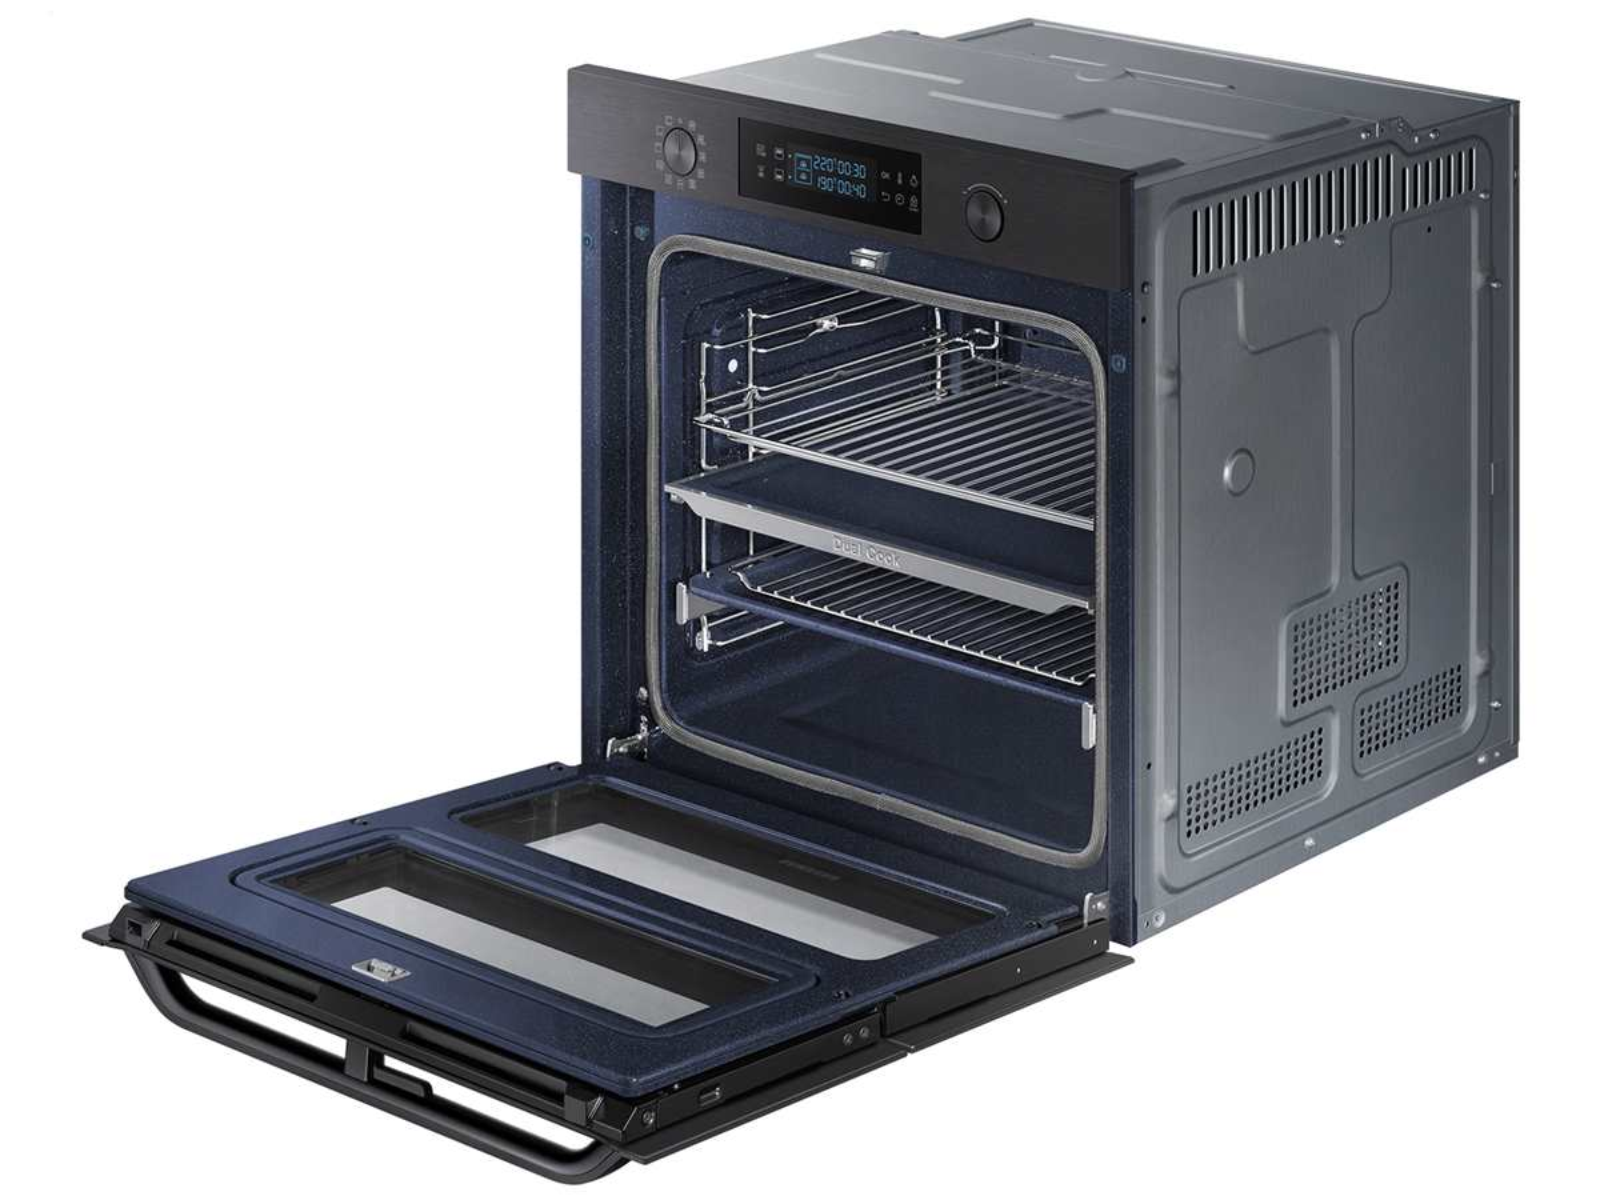 Samsung NV75N5671RM/EG Pyrolyse Backofen Black Steel